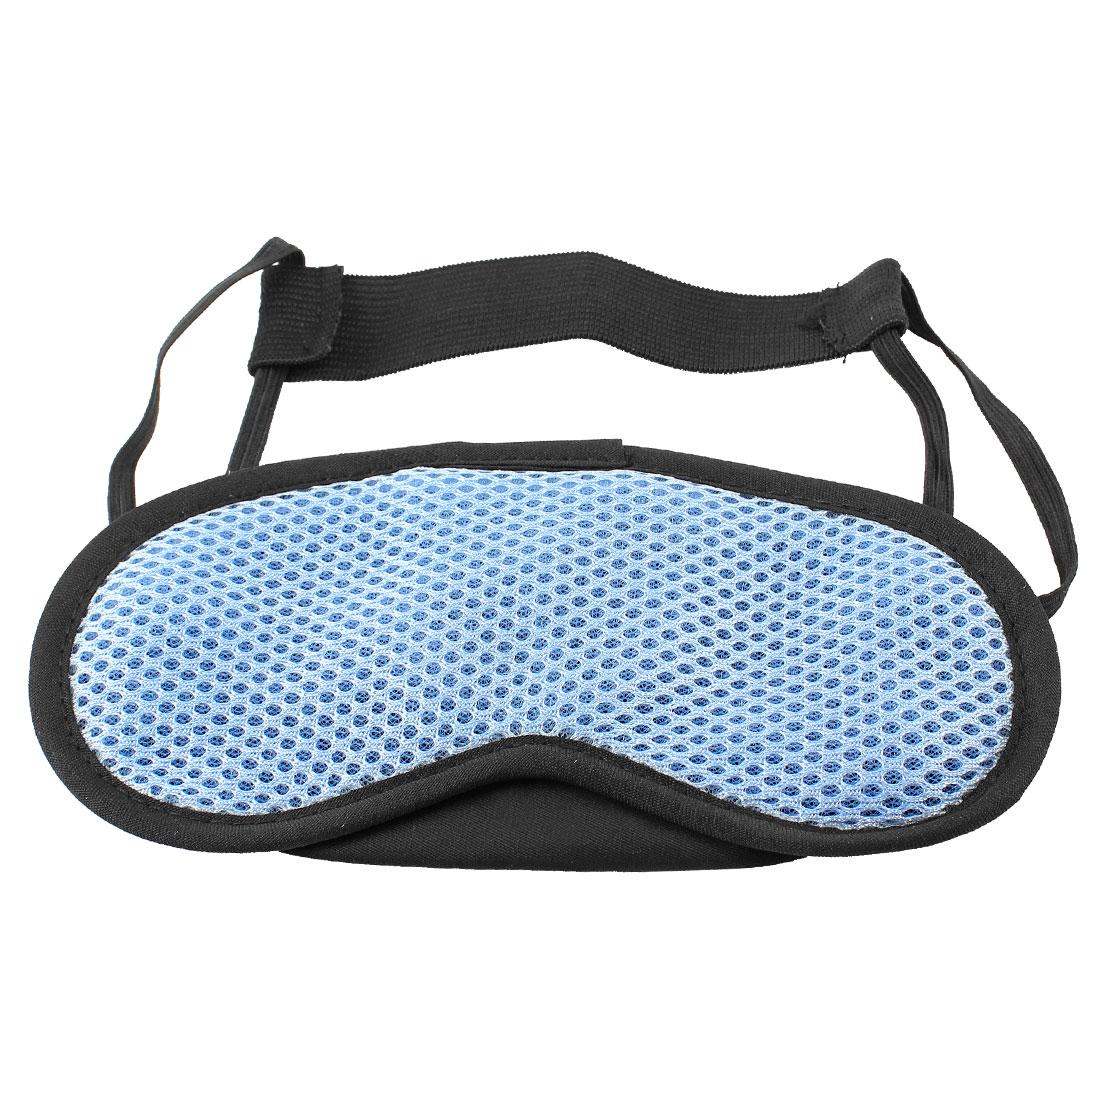 Blue Meshy Stretchy Strap Sleeping Eyeshade Eye Mask Cover Shade